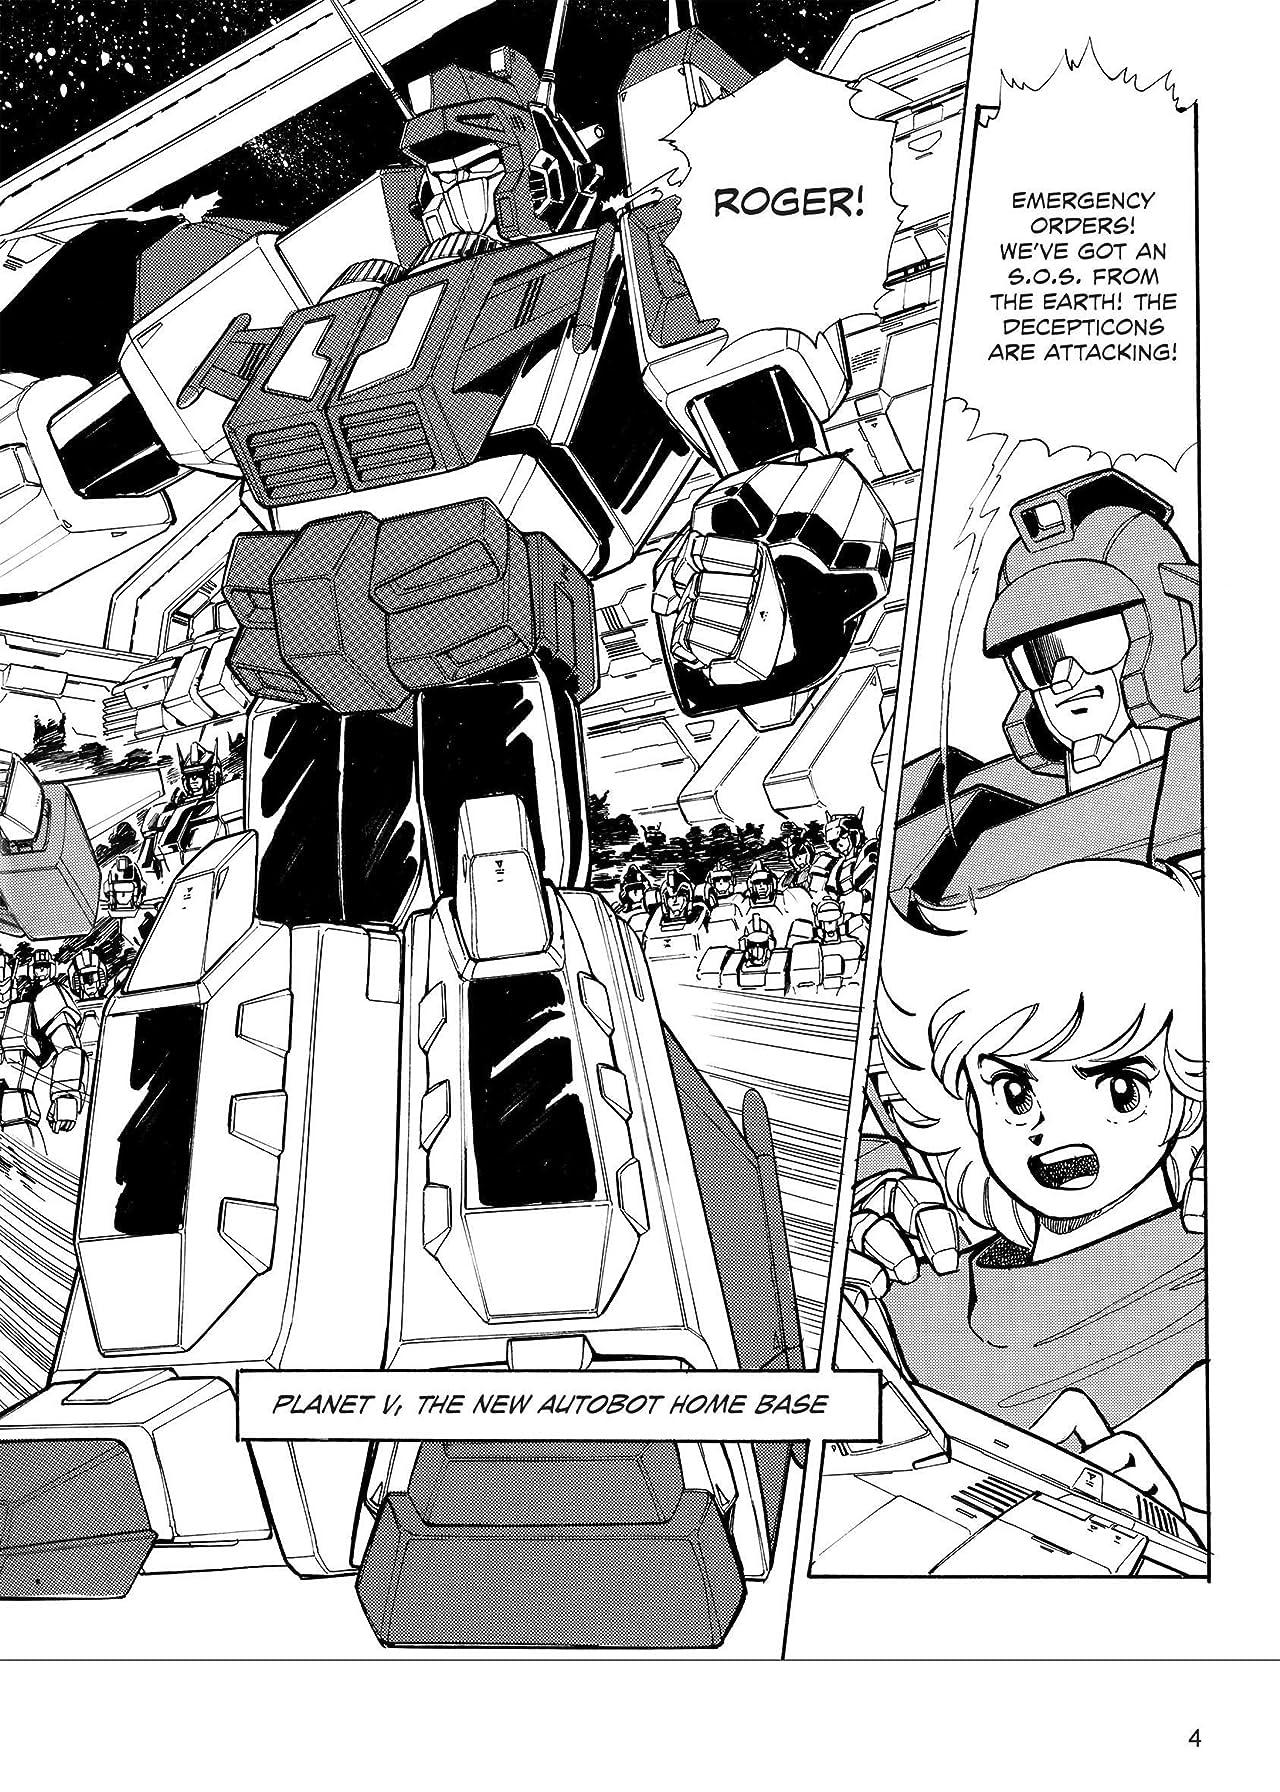 Transformers: The Manga Vol. 3